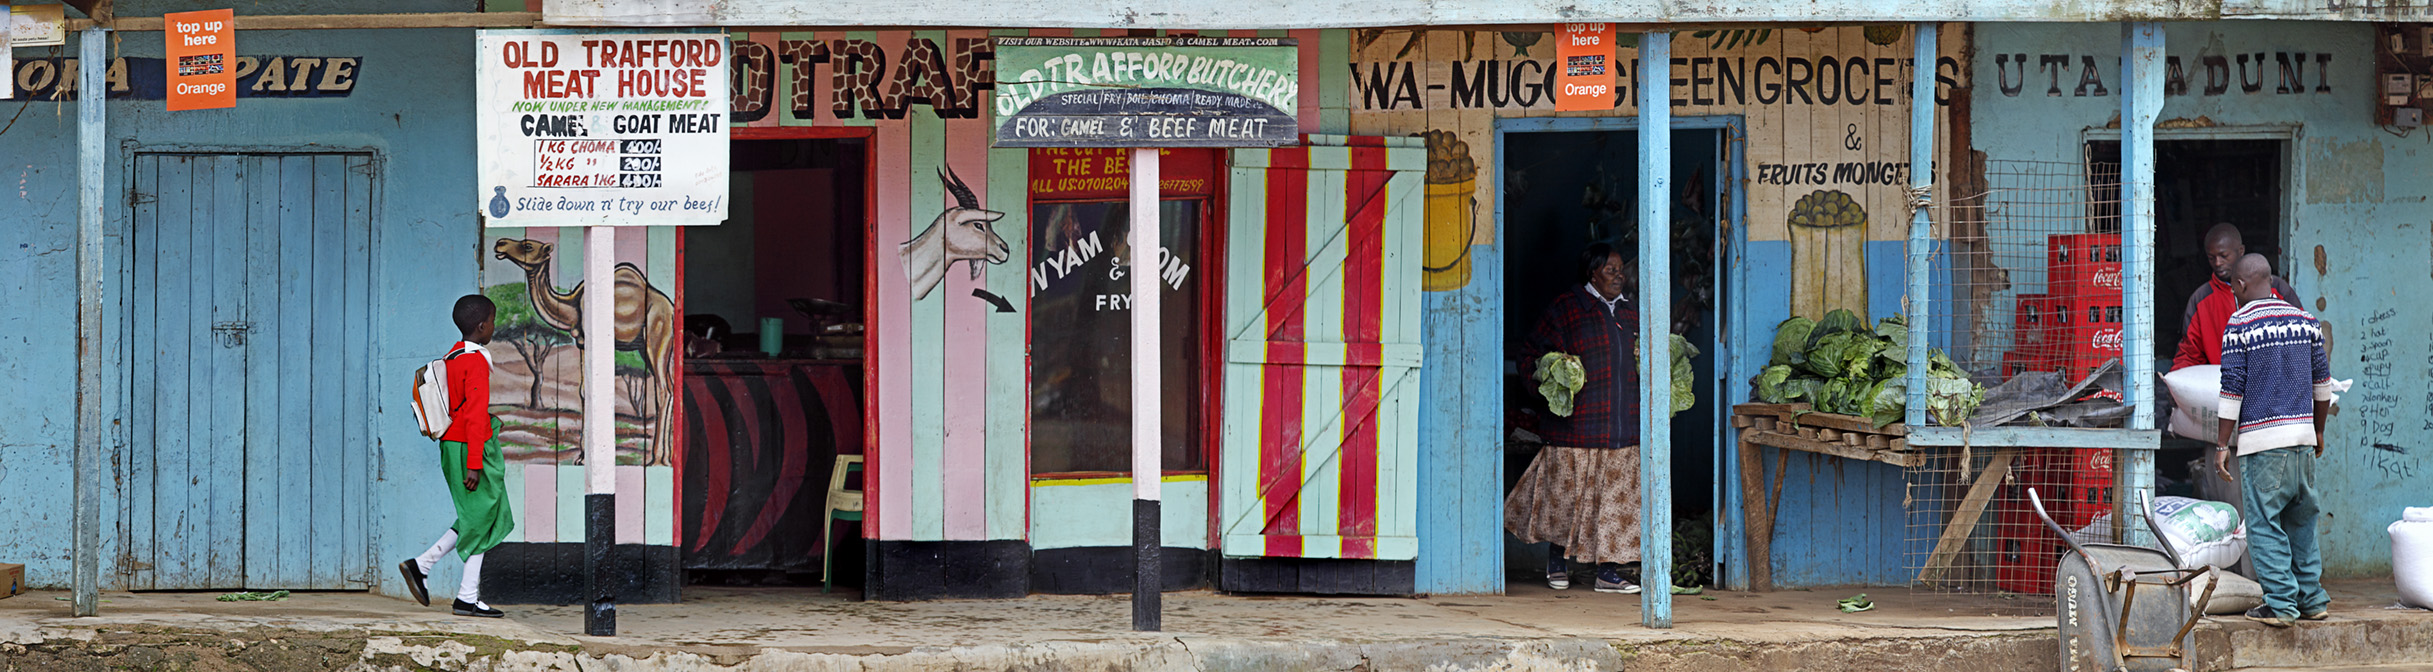 Kenia Maralal WWW_06